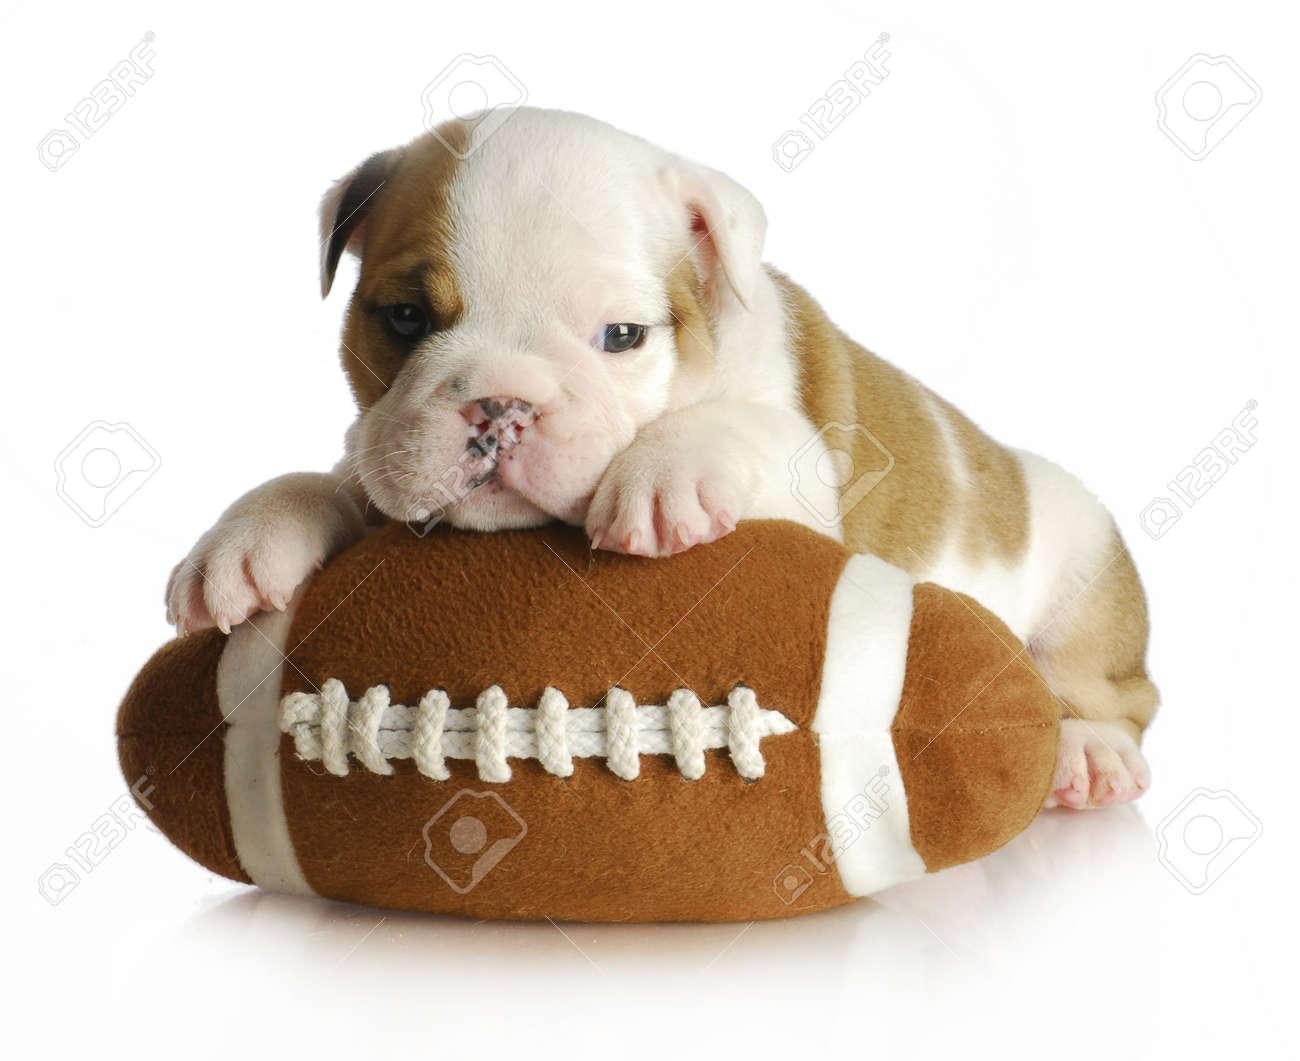 cute puppy with stuffed football  english bulldog  weeks old  - cute puppy with stuffed football  english bulldog  weeks old stock photo